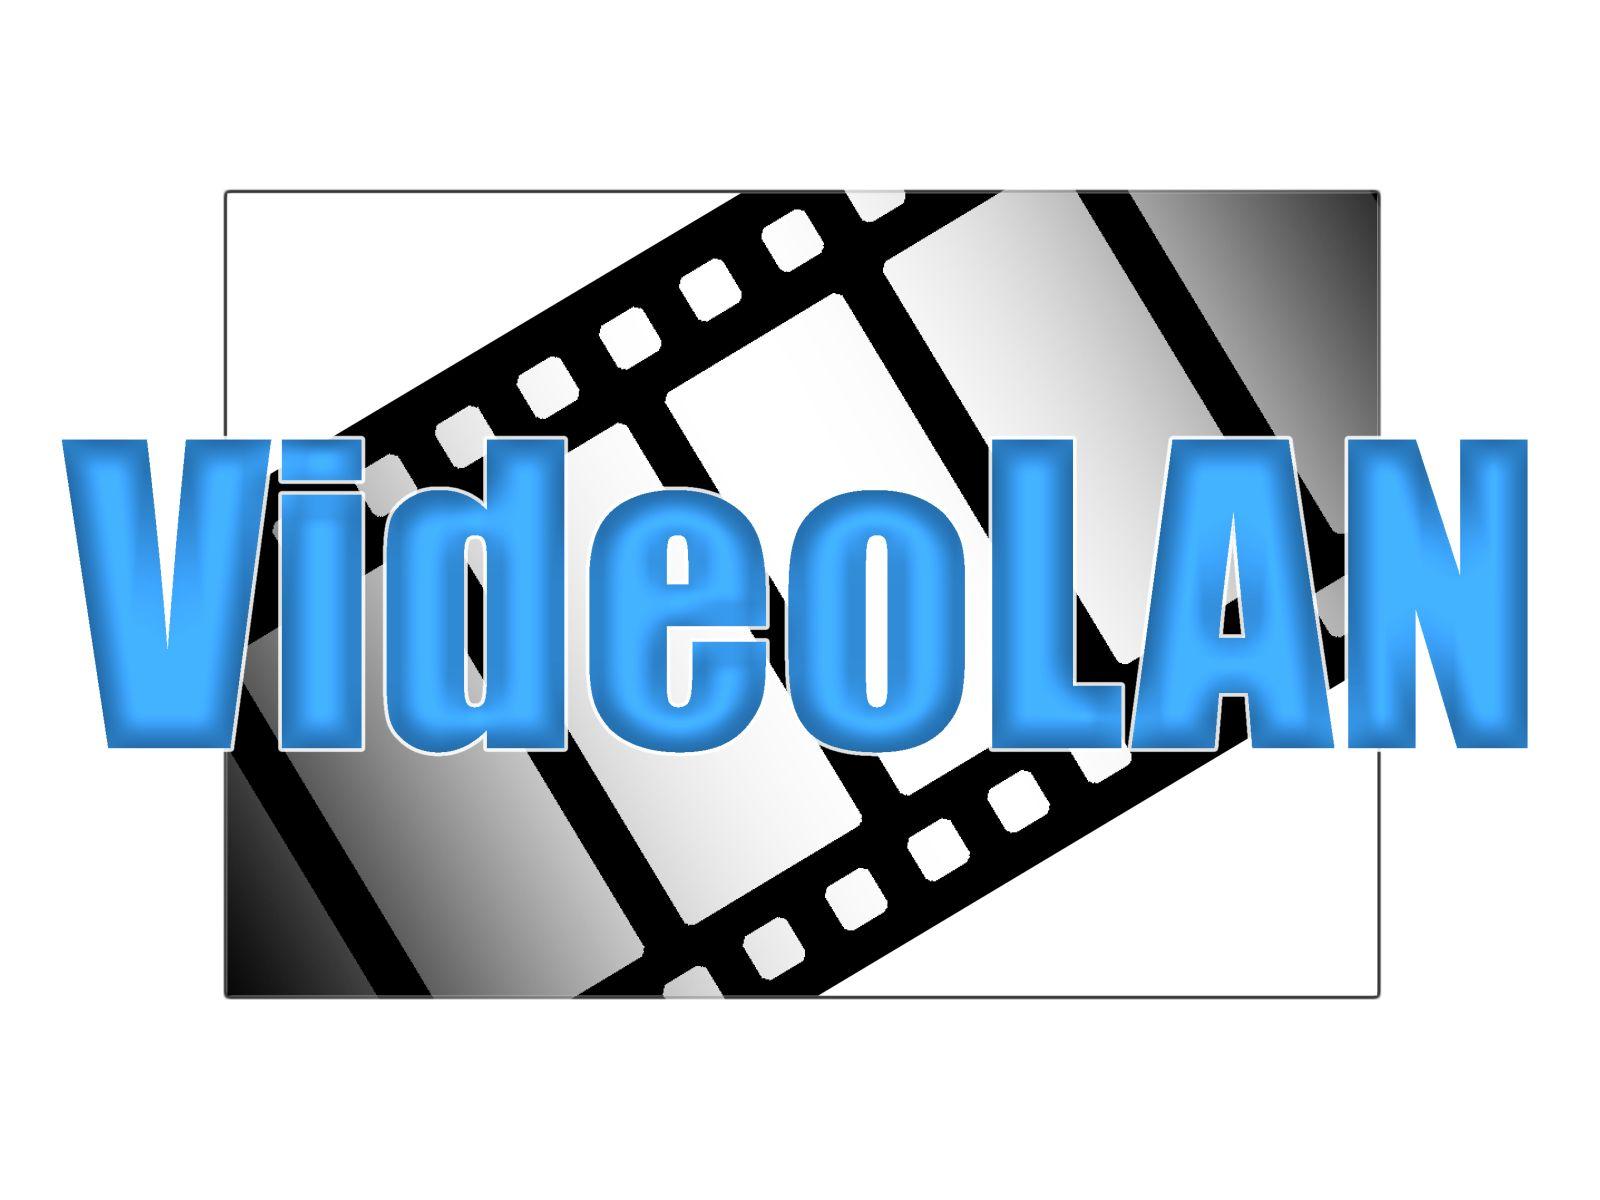 www.videolan.org/images/goodies/videolan/vl4_1600x1200.jpg